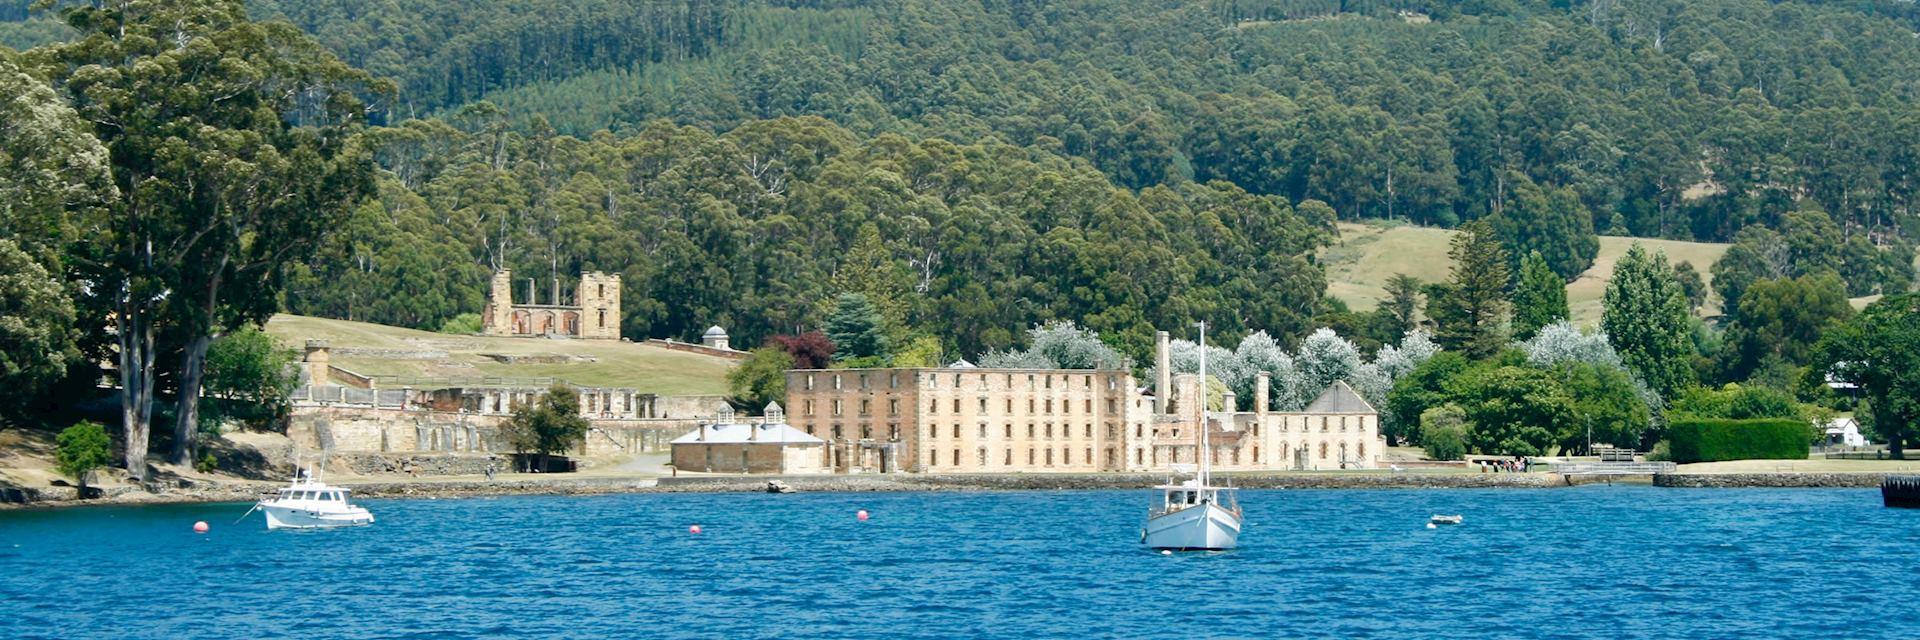 Historic prison and ruins in Port Arthur, Tasmania, Australia